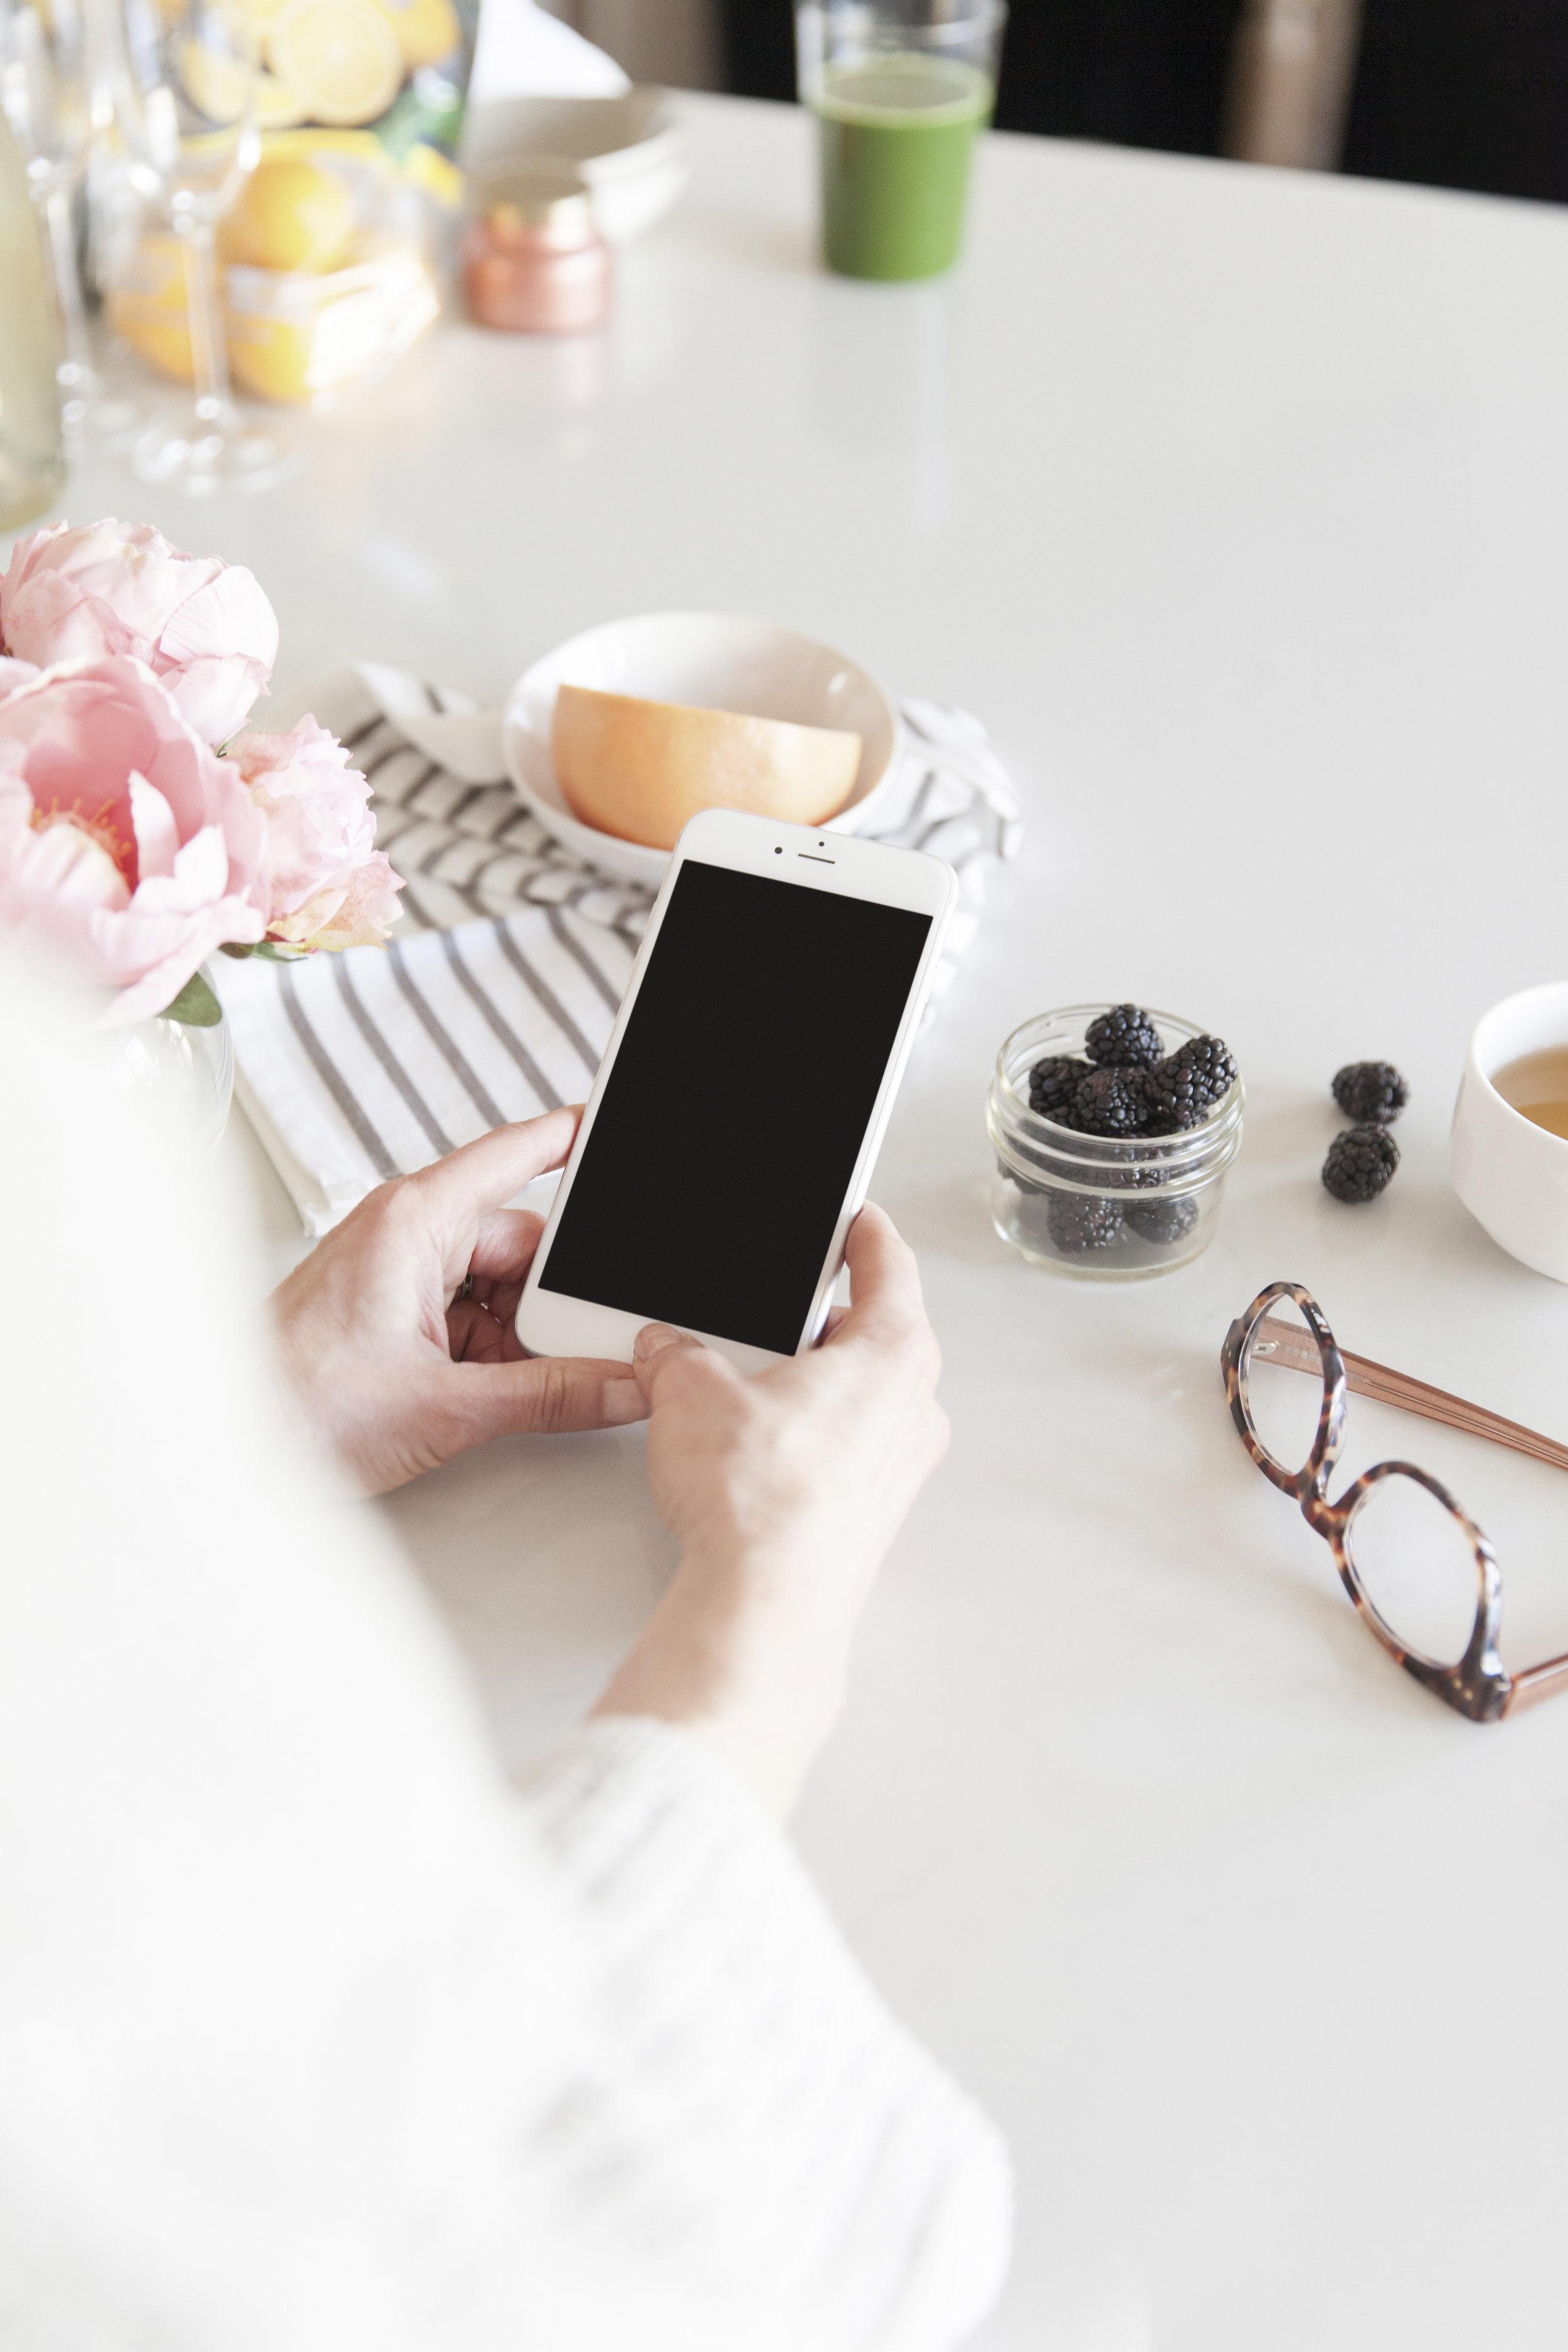 fotograferen  met je iPhone of samsung android workshop